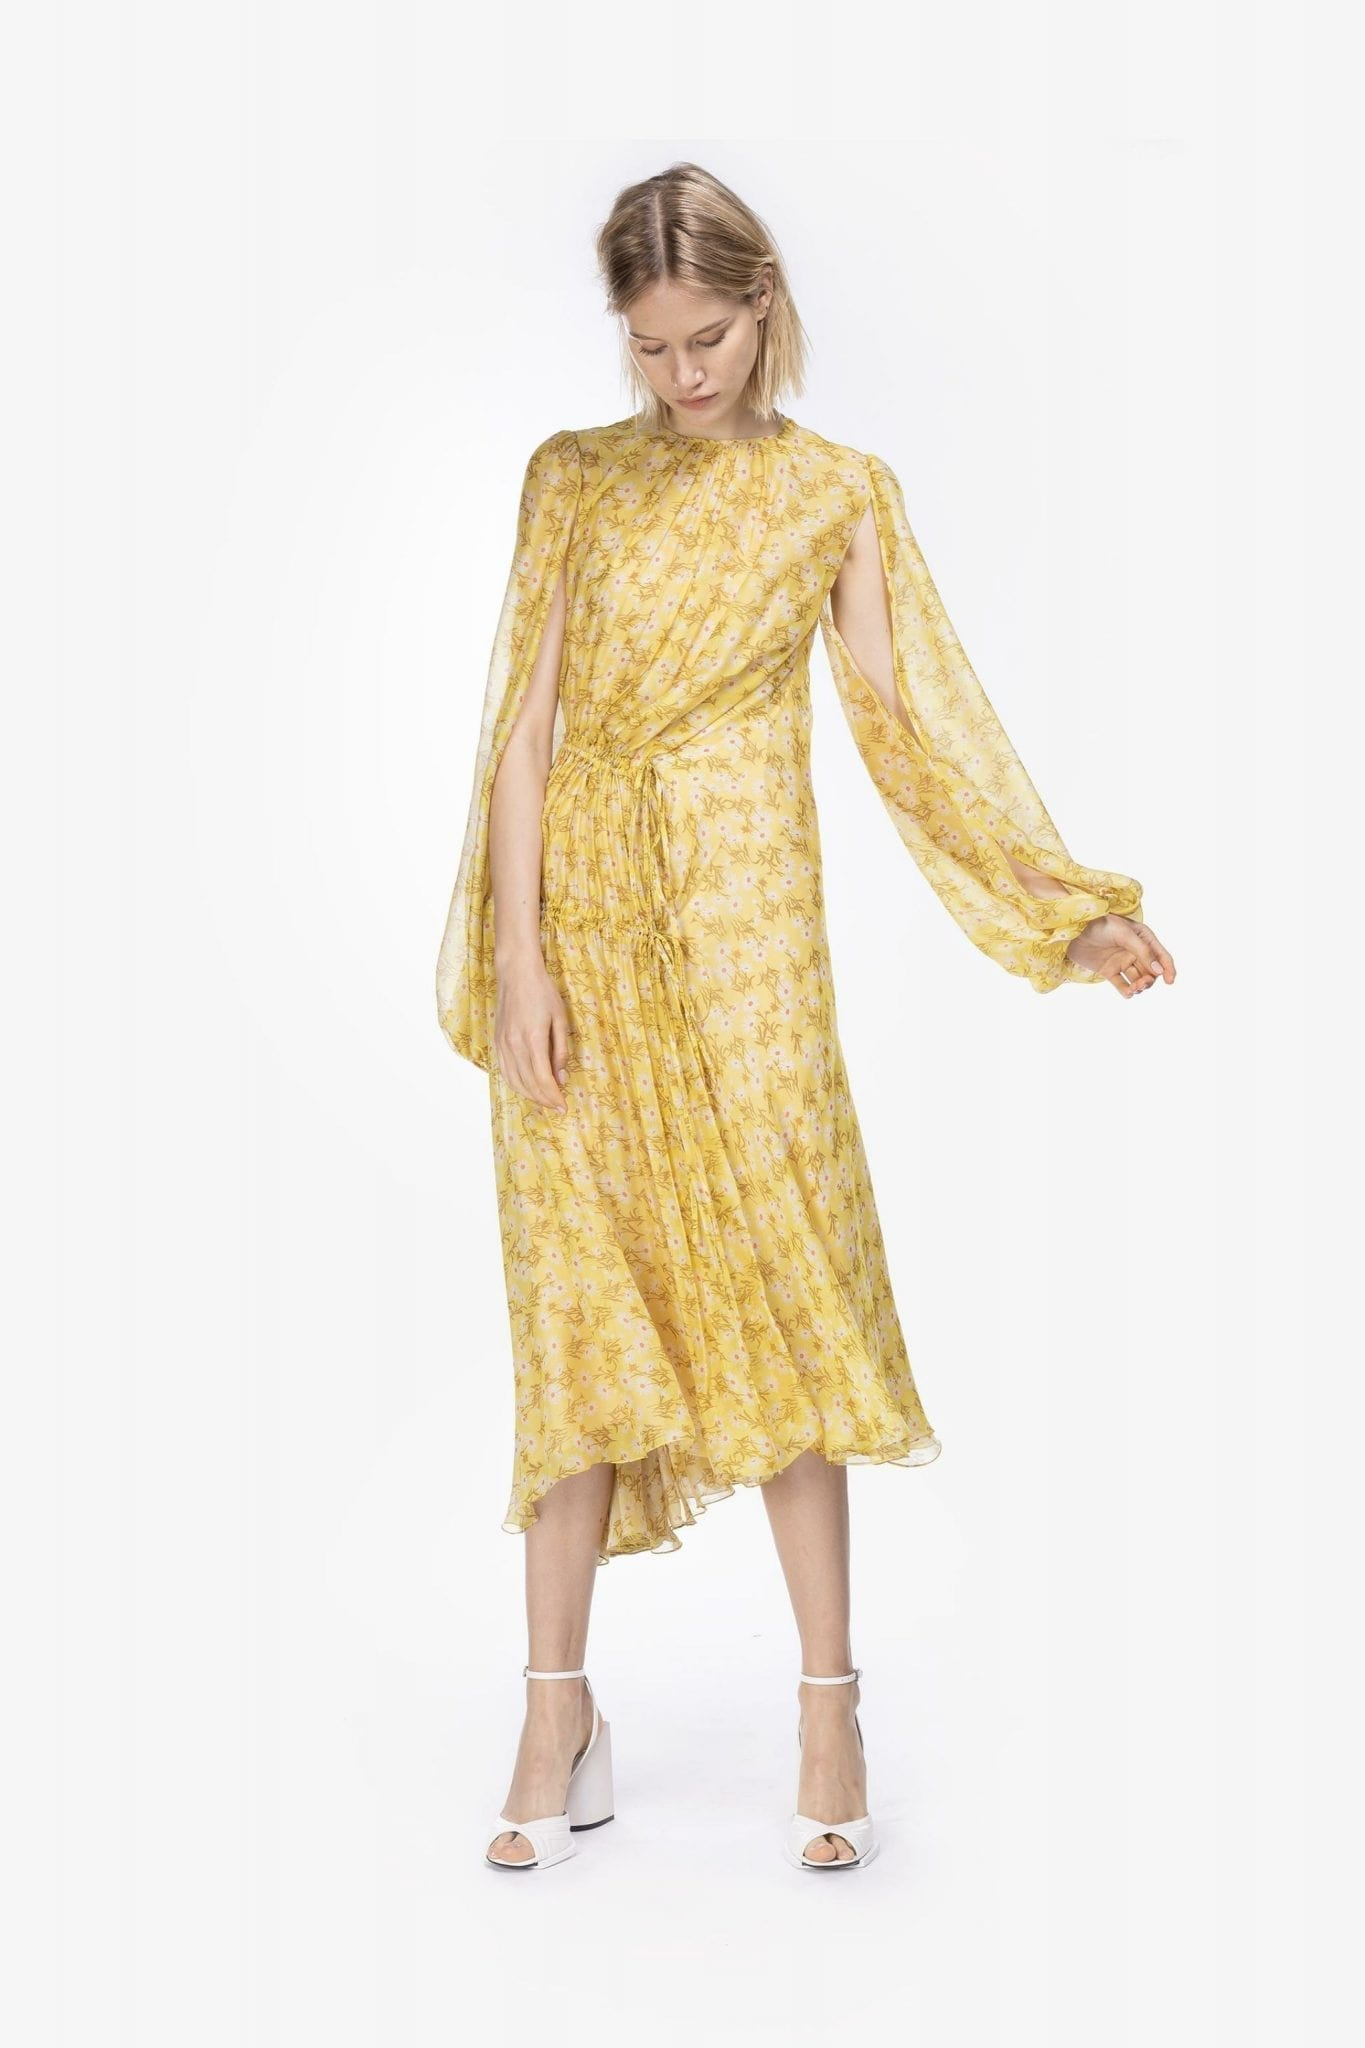 N20 Ruched Pâquerettes Print Dress